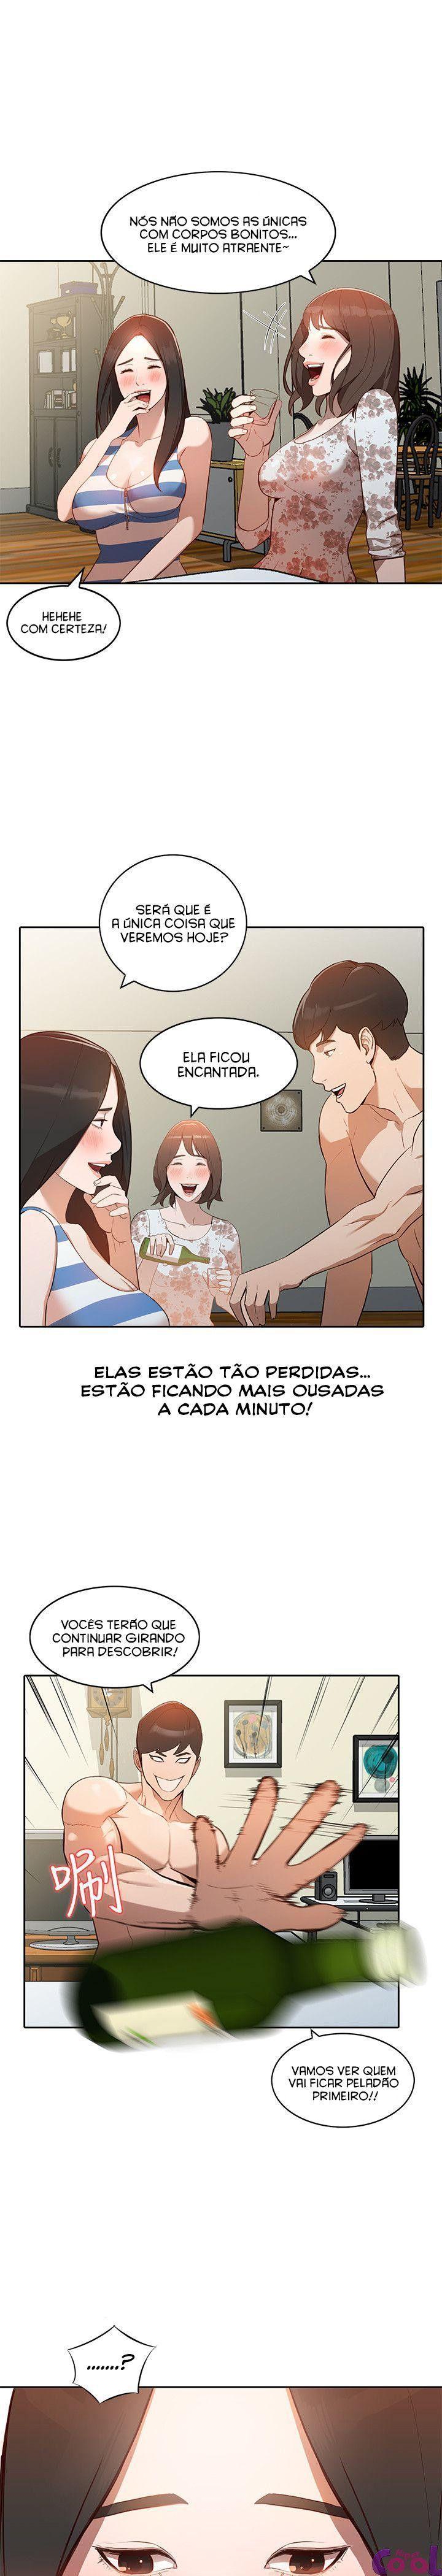 Mulher Casada 02 - Foto 9